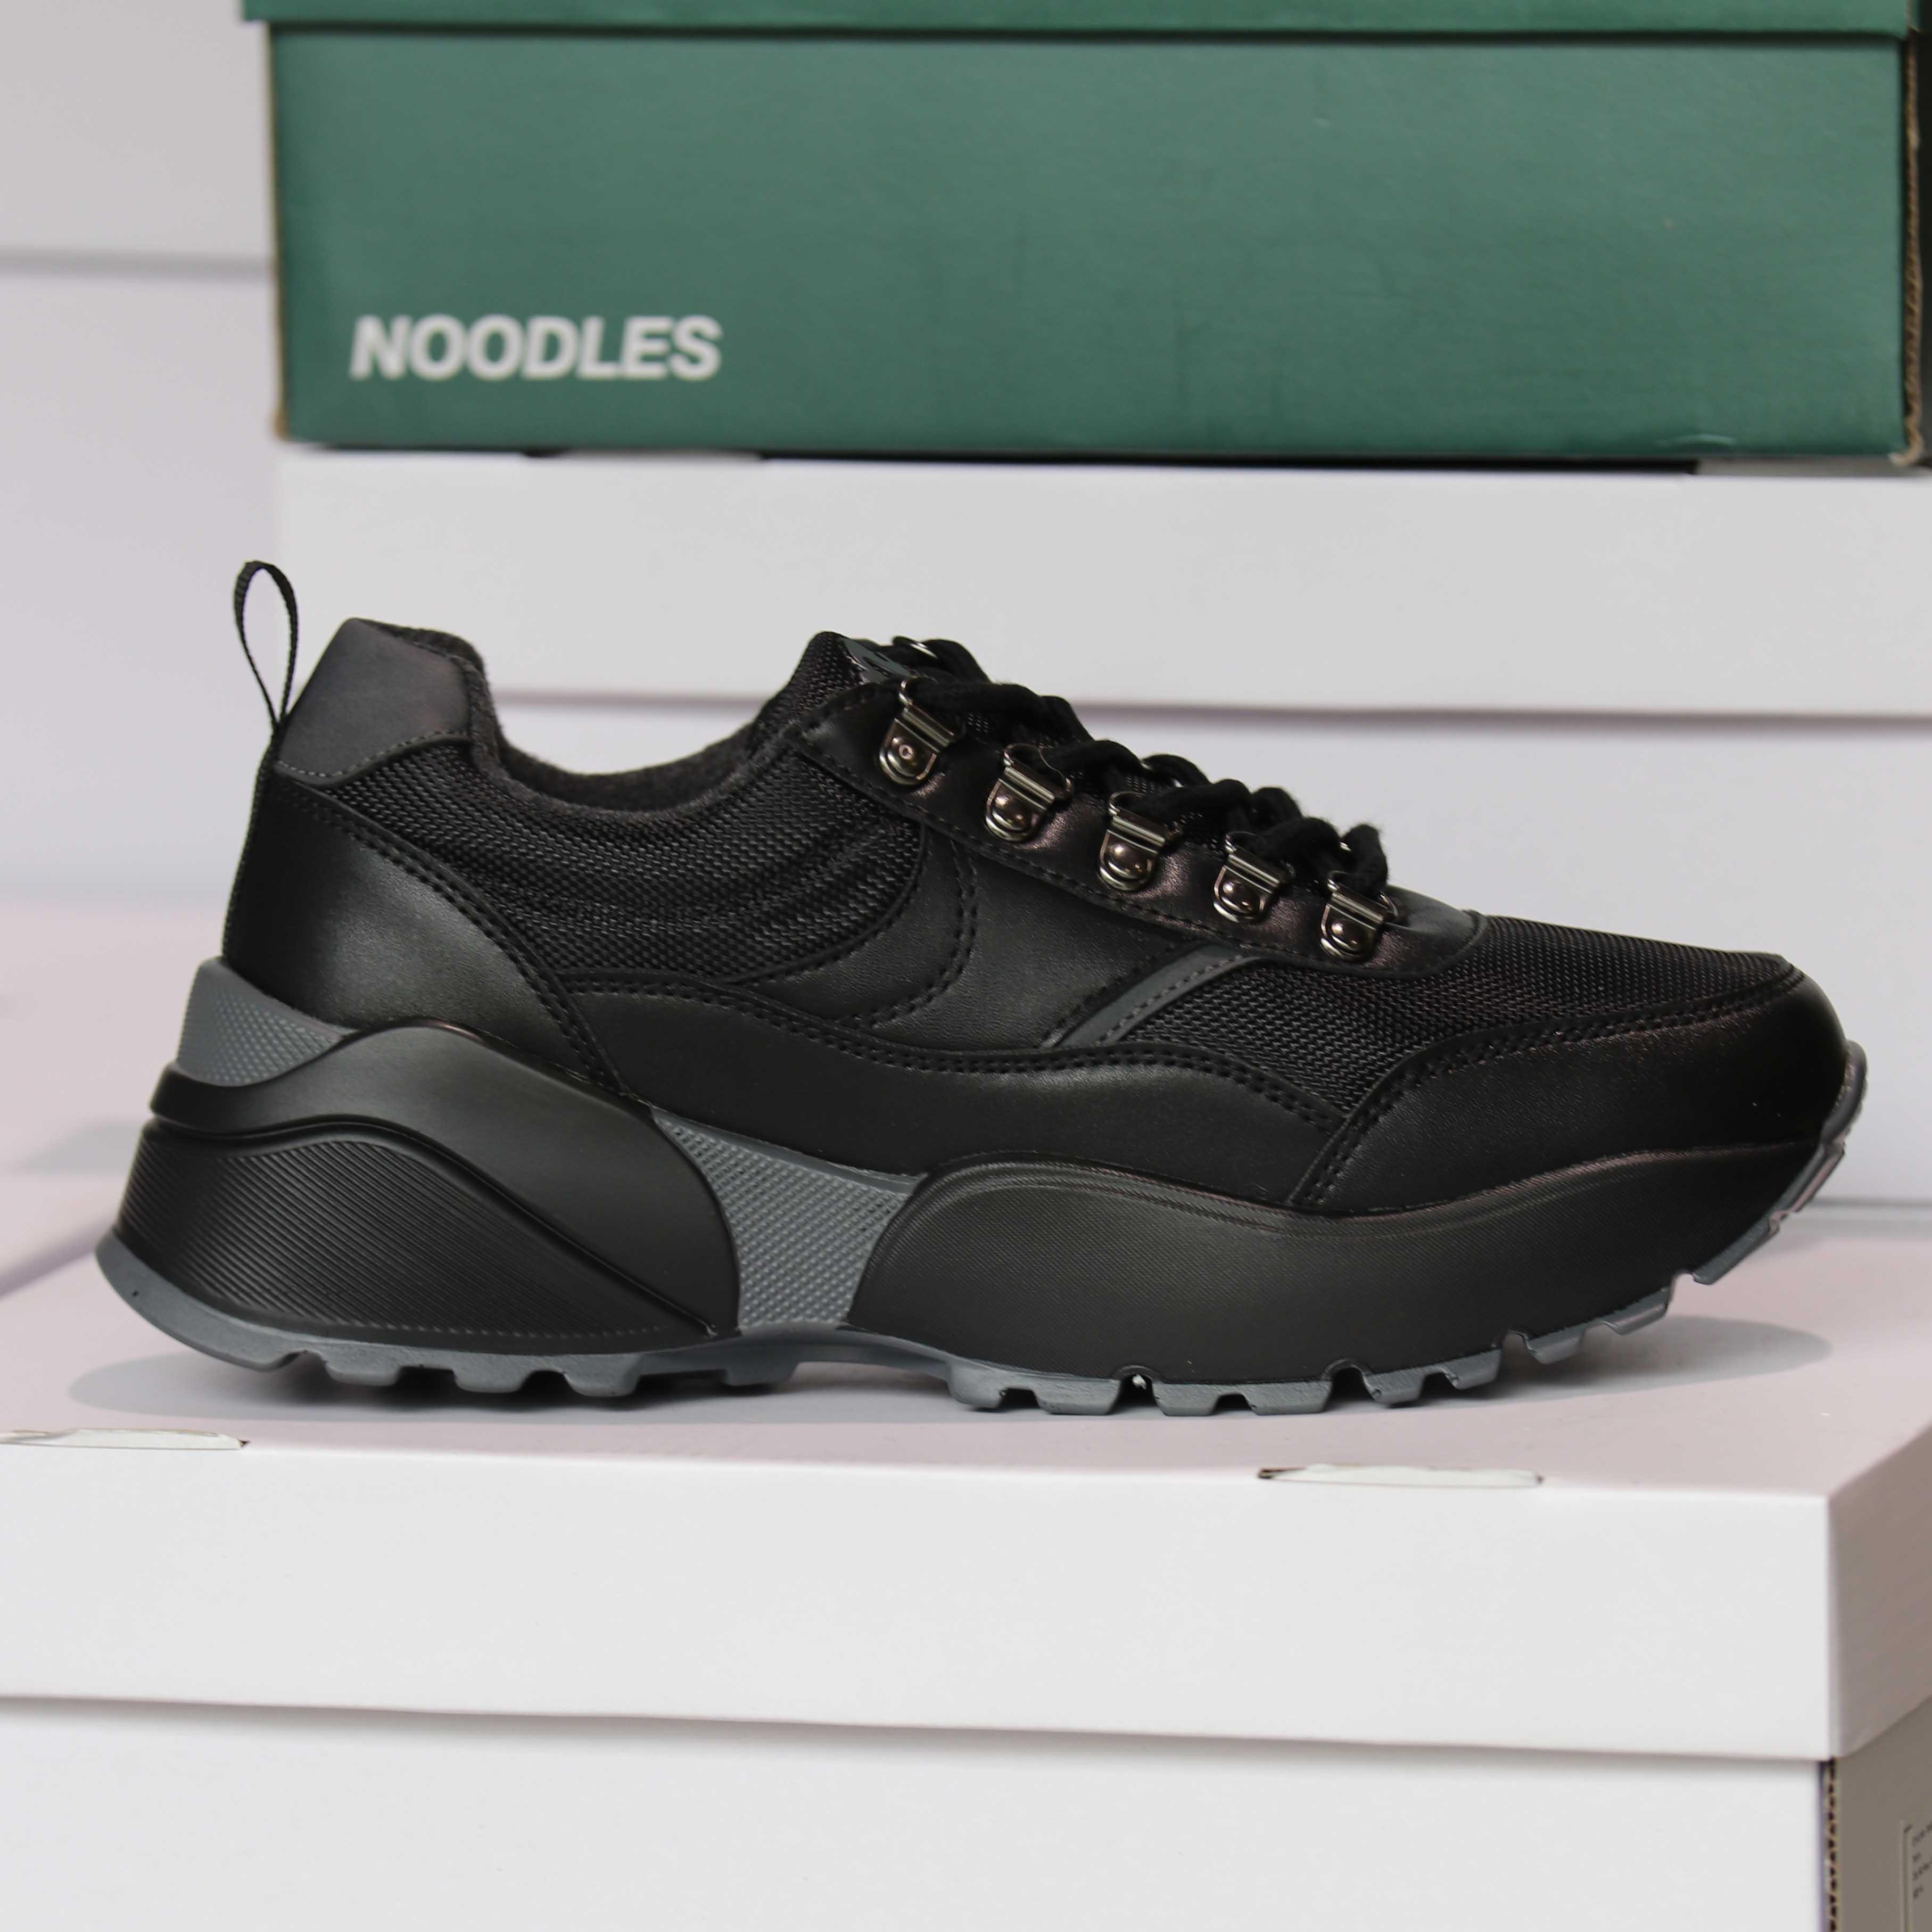 noodles chunko low black sneakers dame5